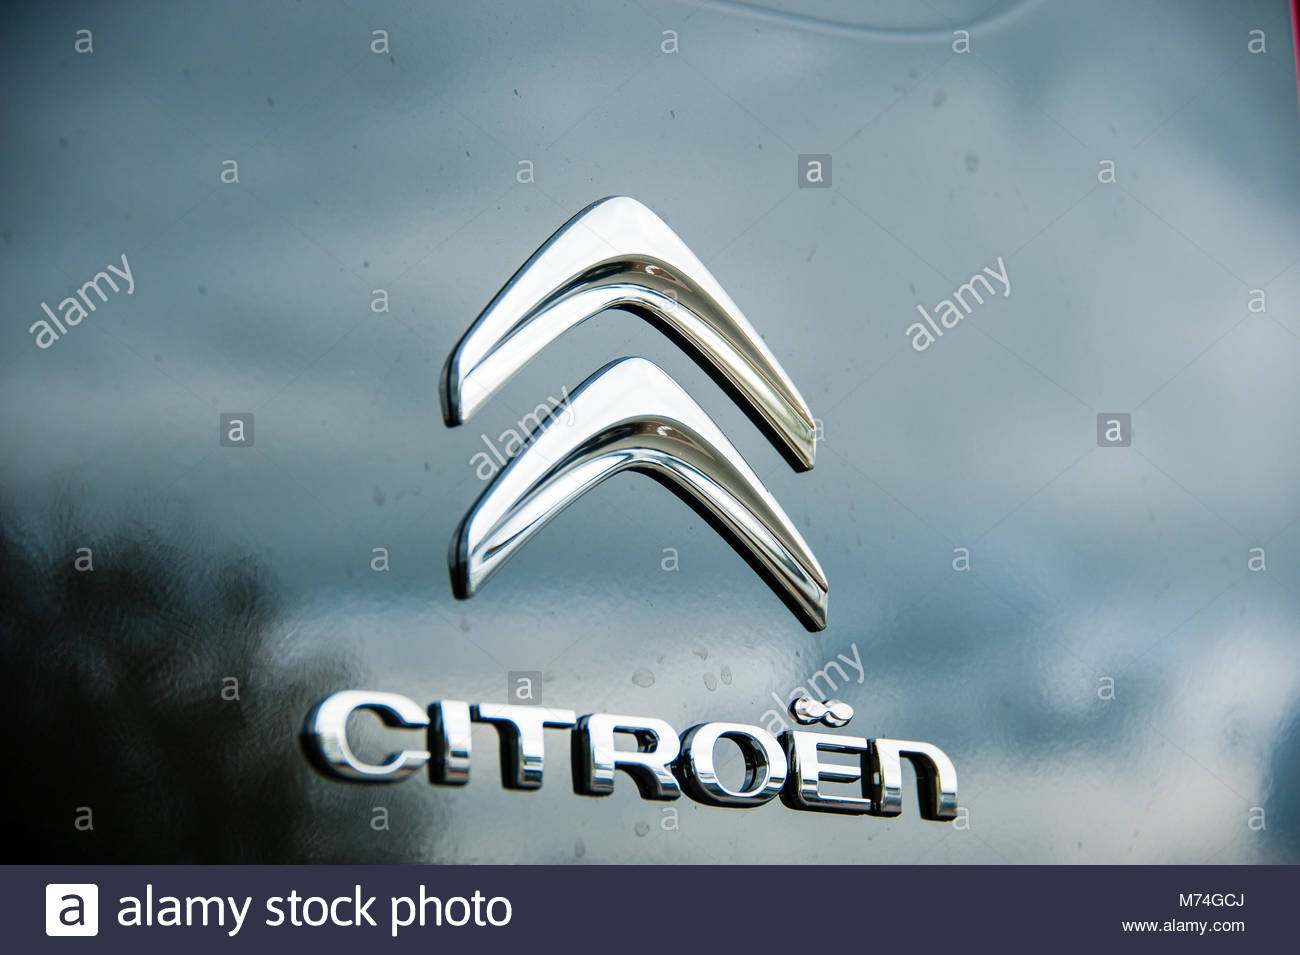 Citroen logo & sign on the front grill of a black Citroen Berlingo combo van, England UK Stock Photo